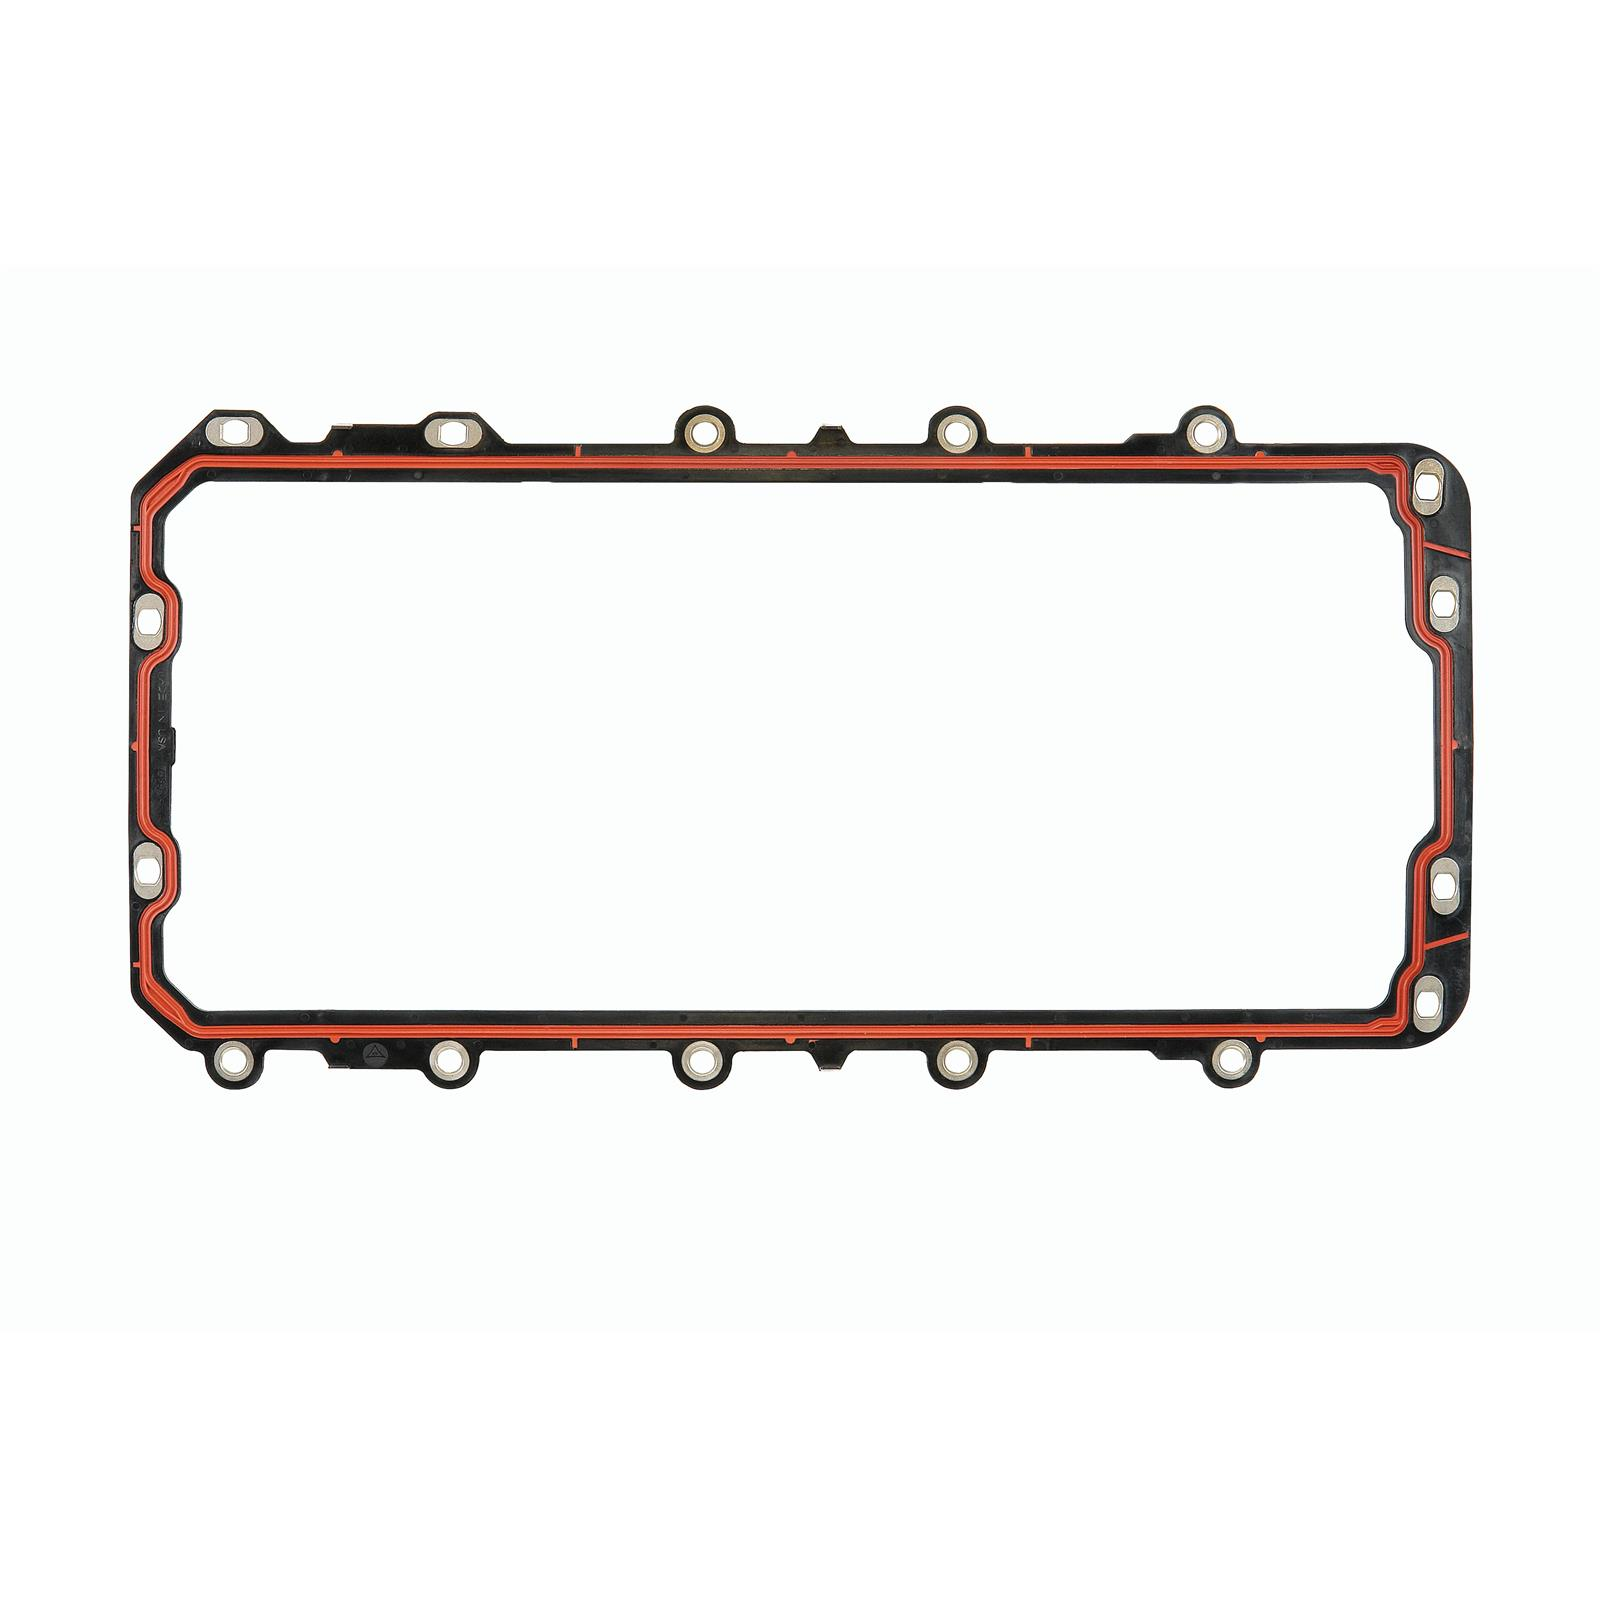 Gasket 5889 Ultra-Seal Oil Pan Gasket Set Mr